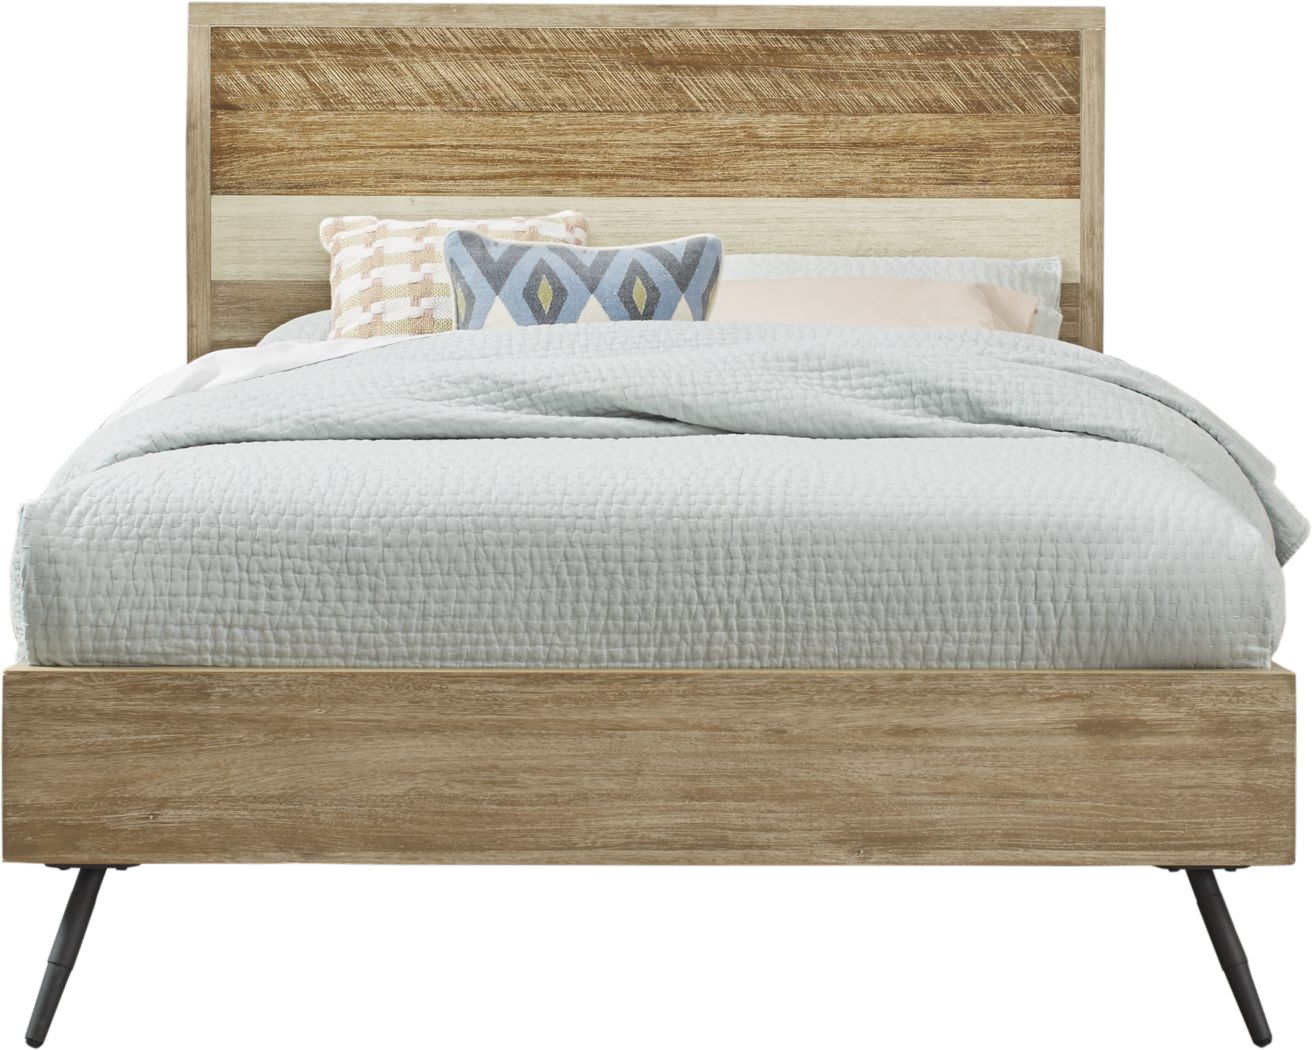 Midtown Loft Natural 3 Pc King Panel Bed